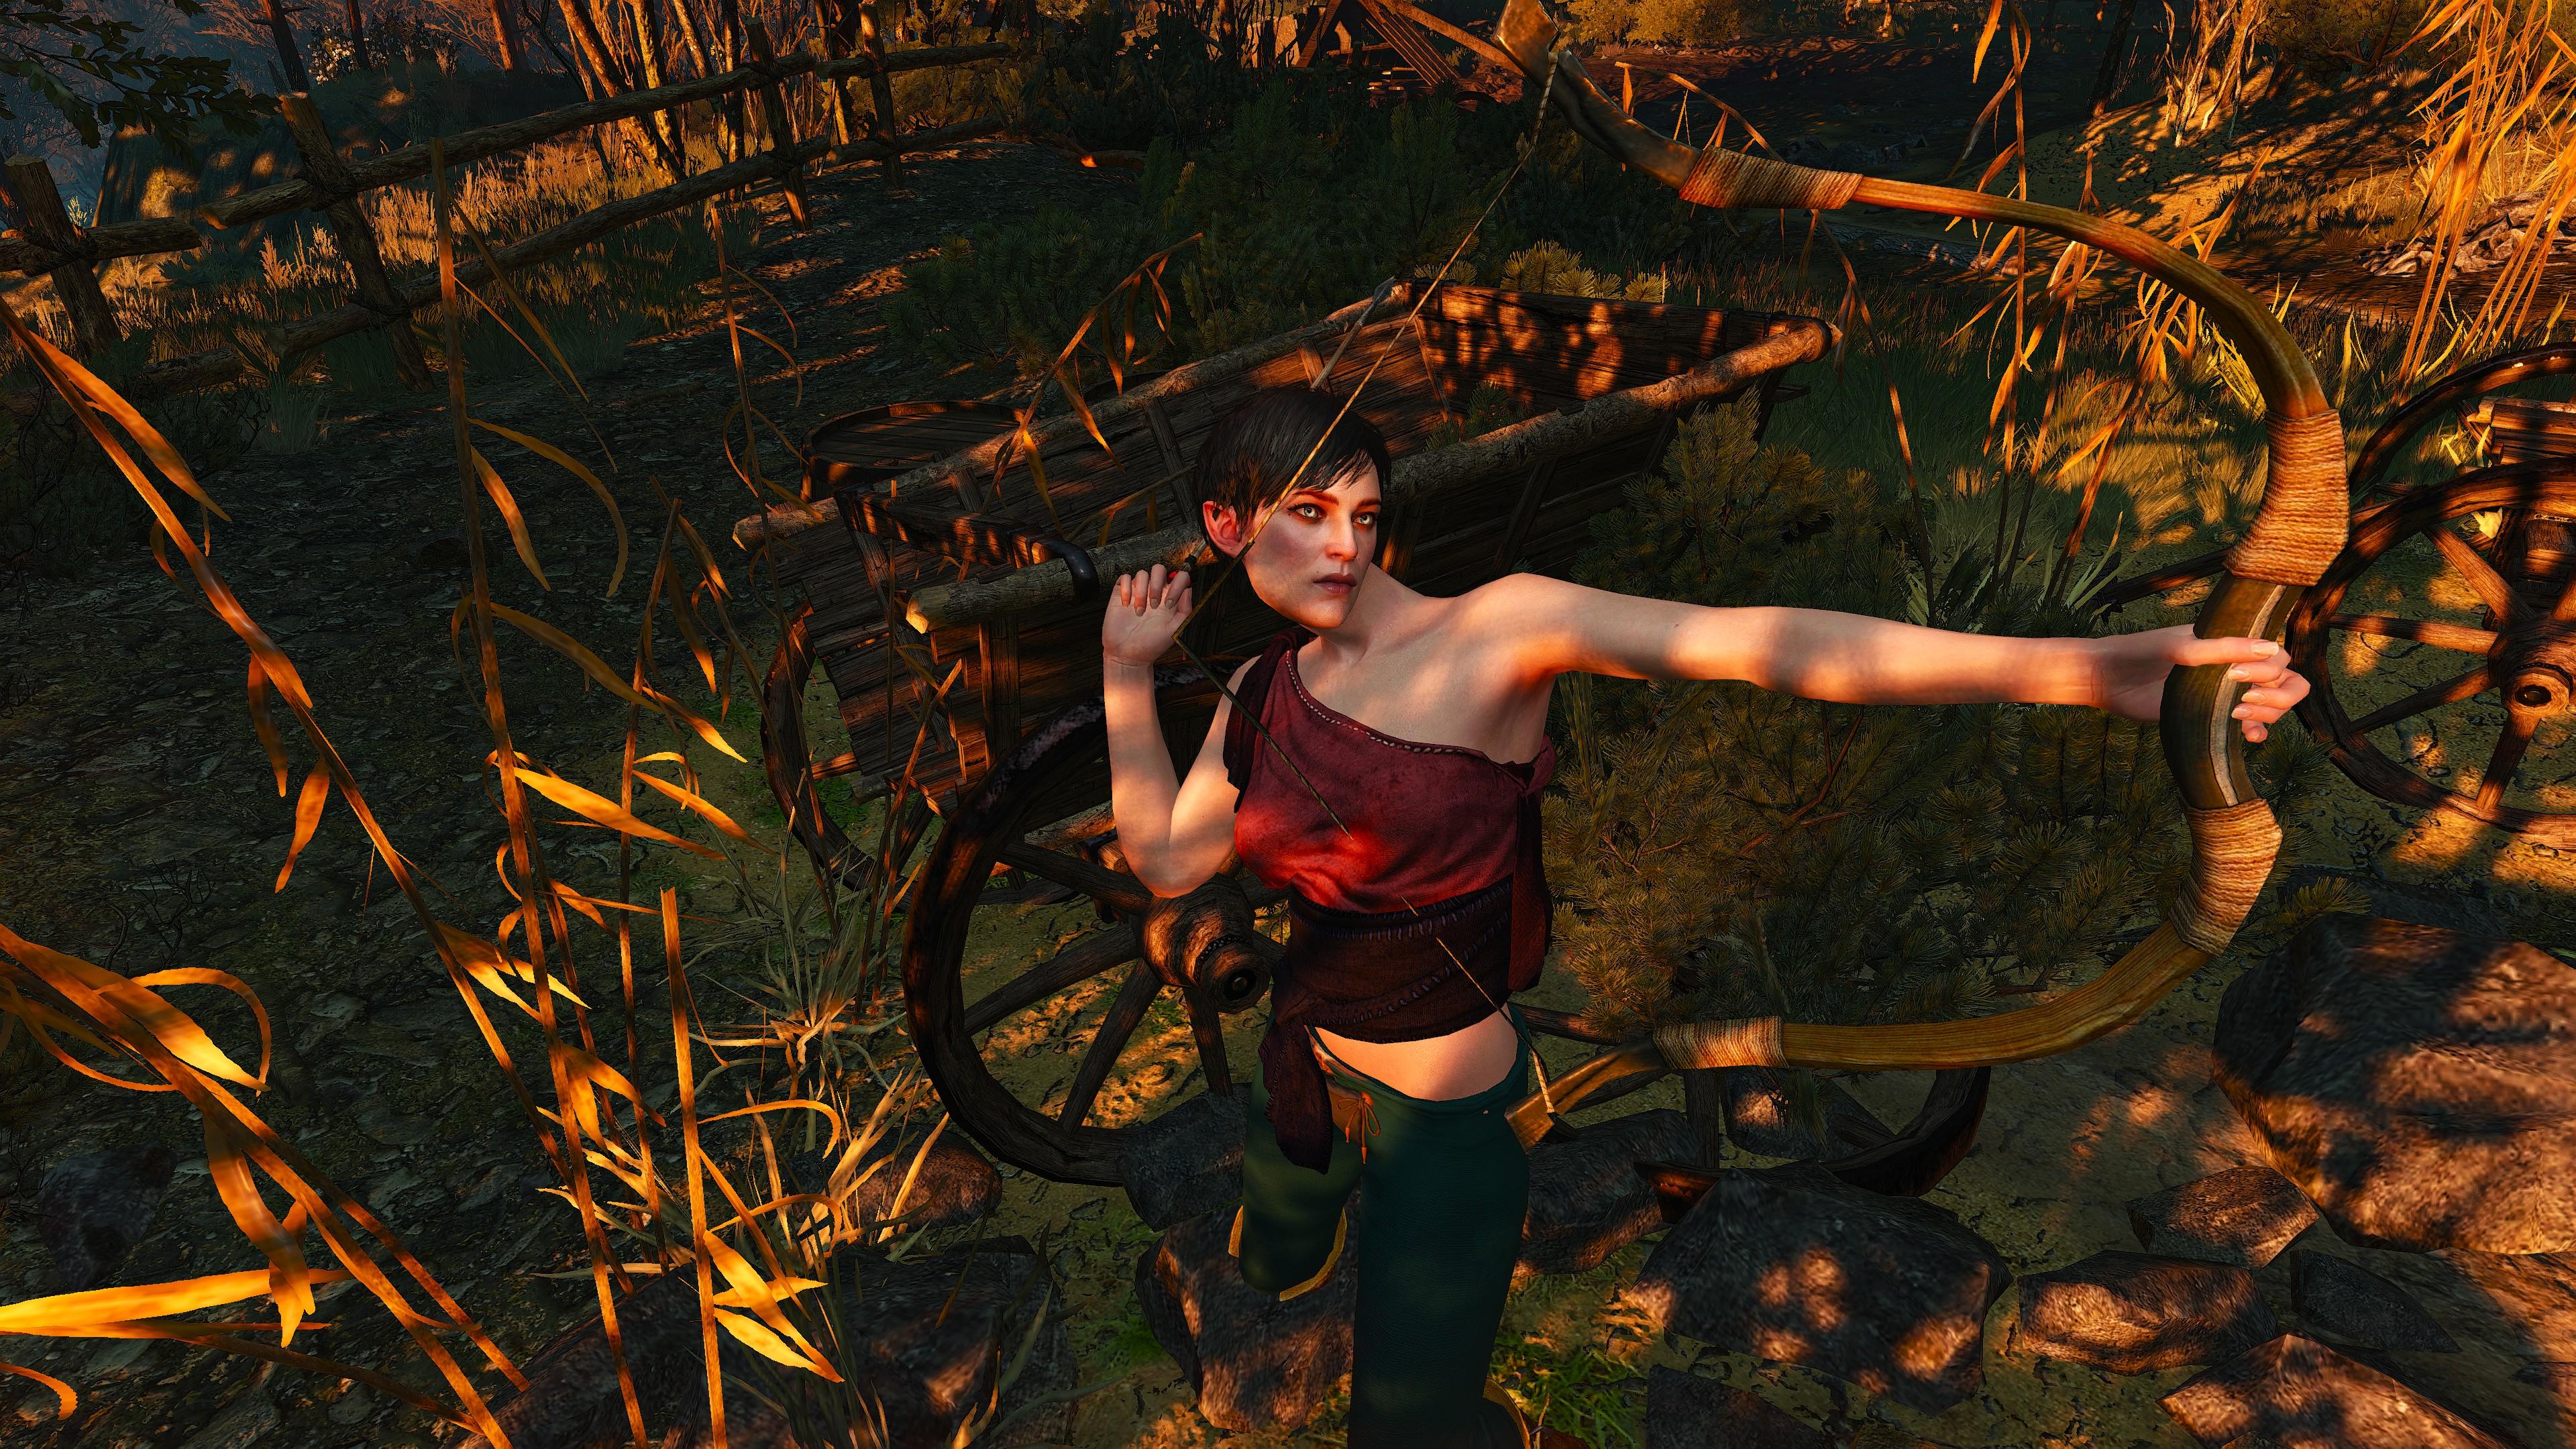 The Witcher 3 Screenshot 2020.07.23 - 20.07.36.jpg - The Witcher 3: Wild Hunt